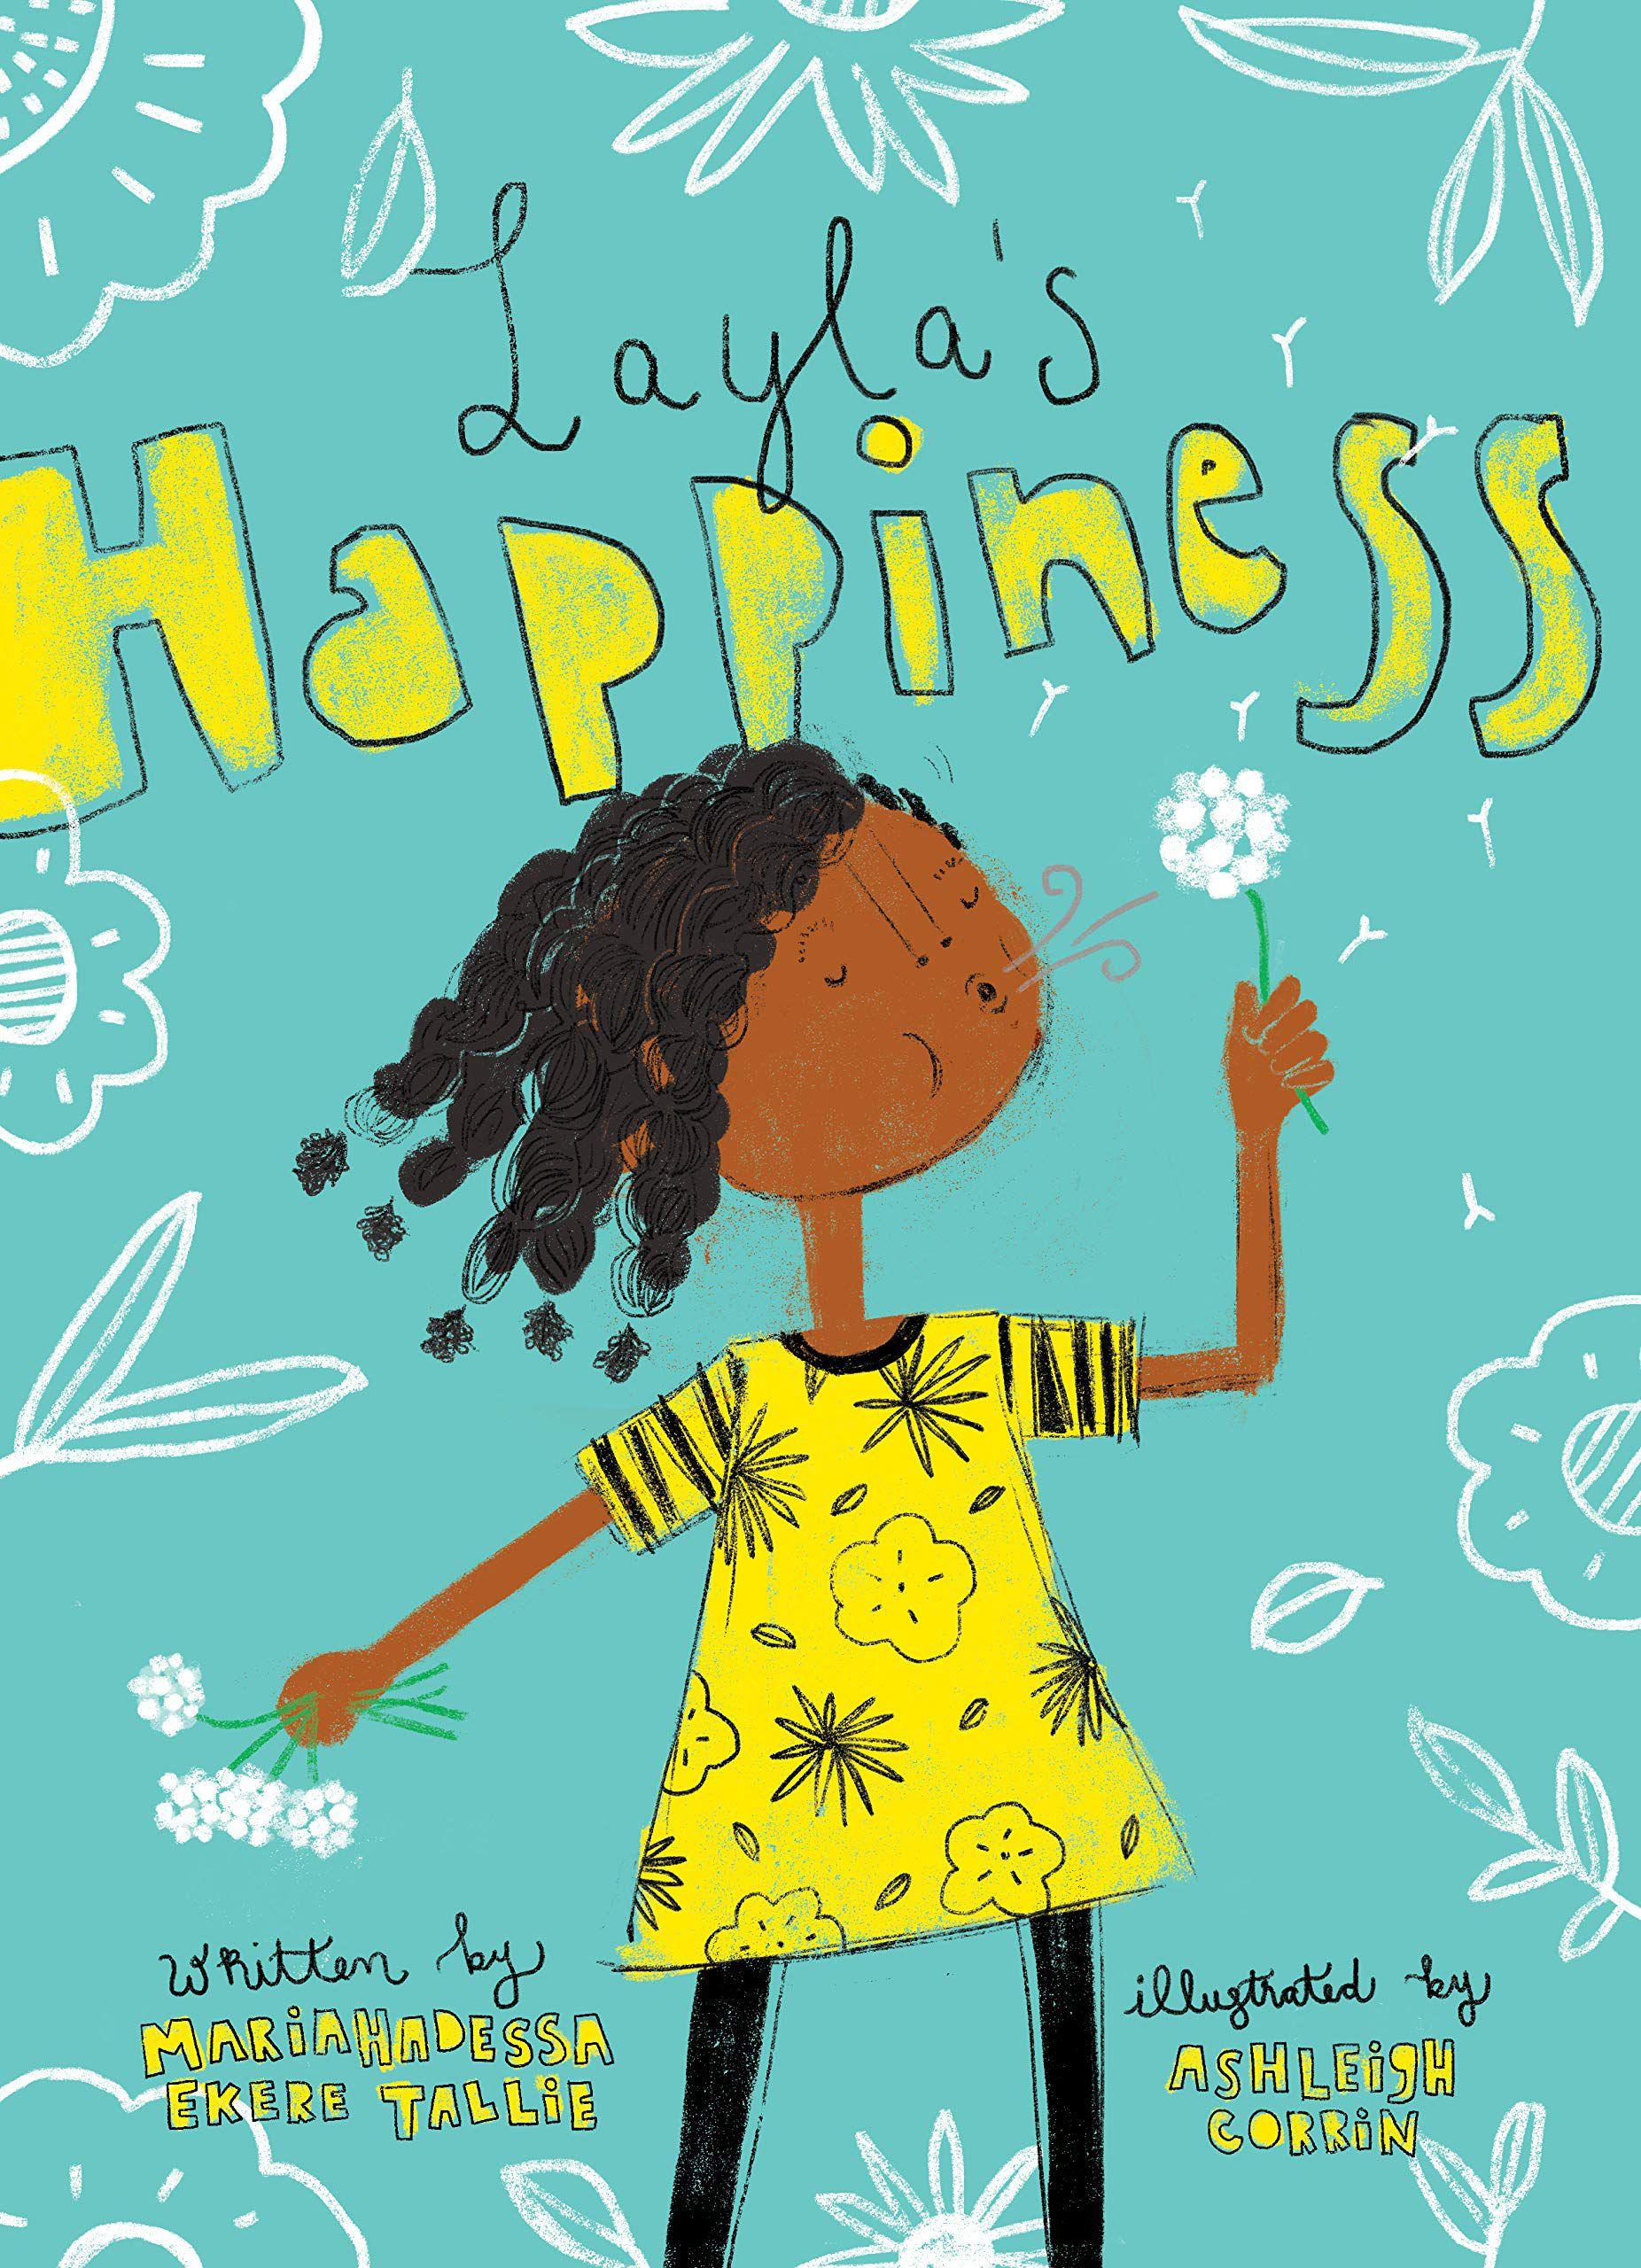 Capa do livro Layla's Happiness